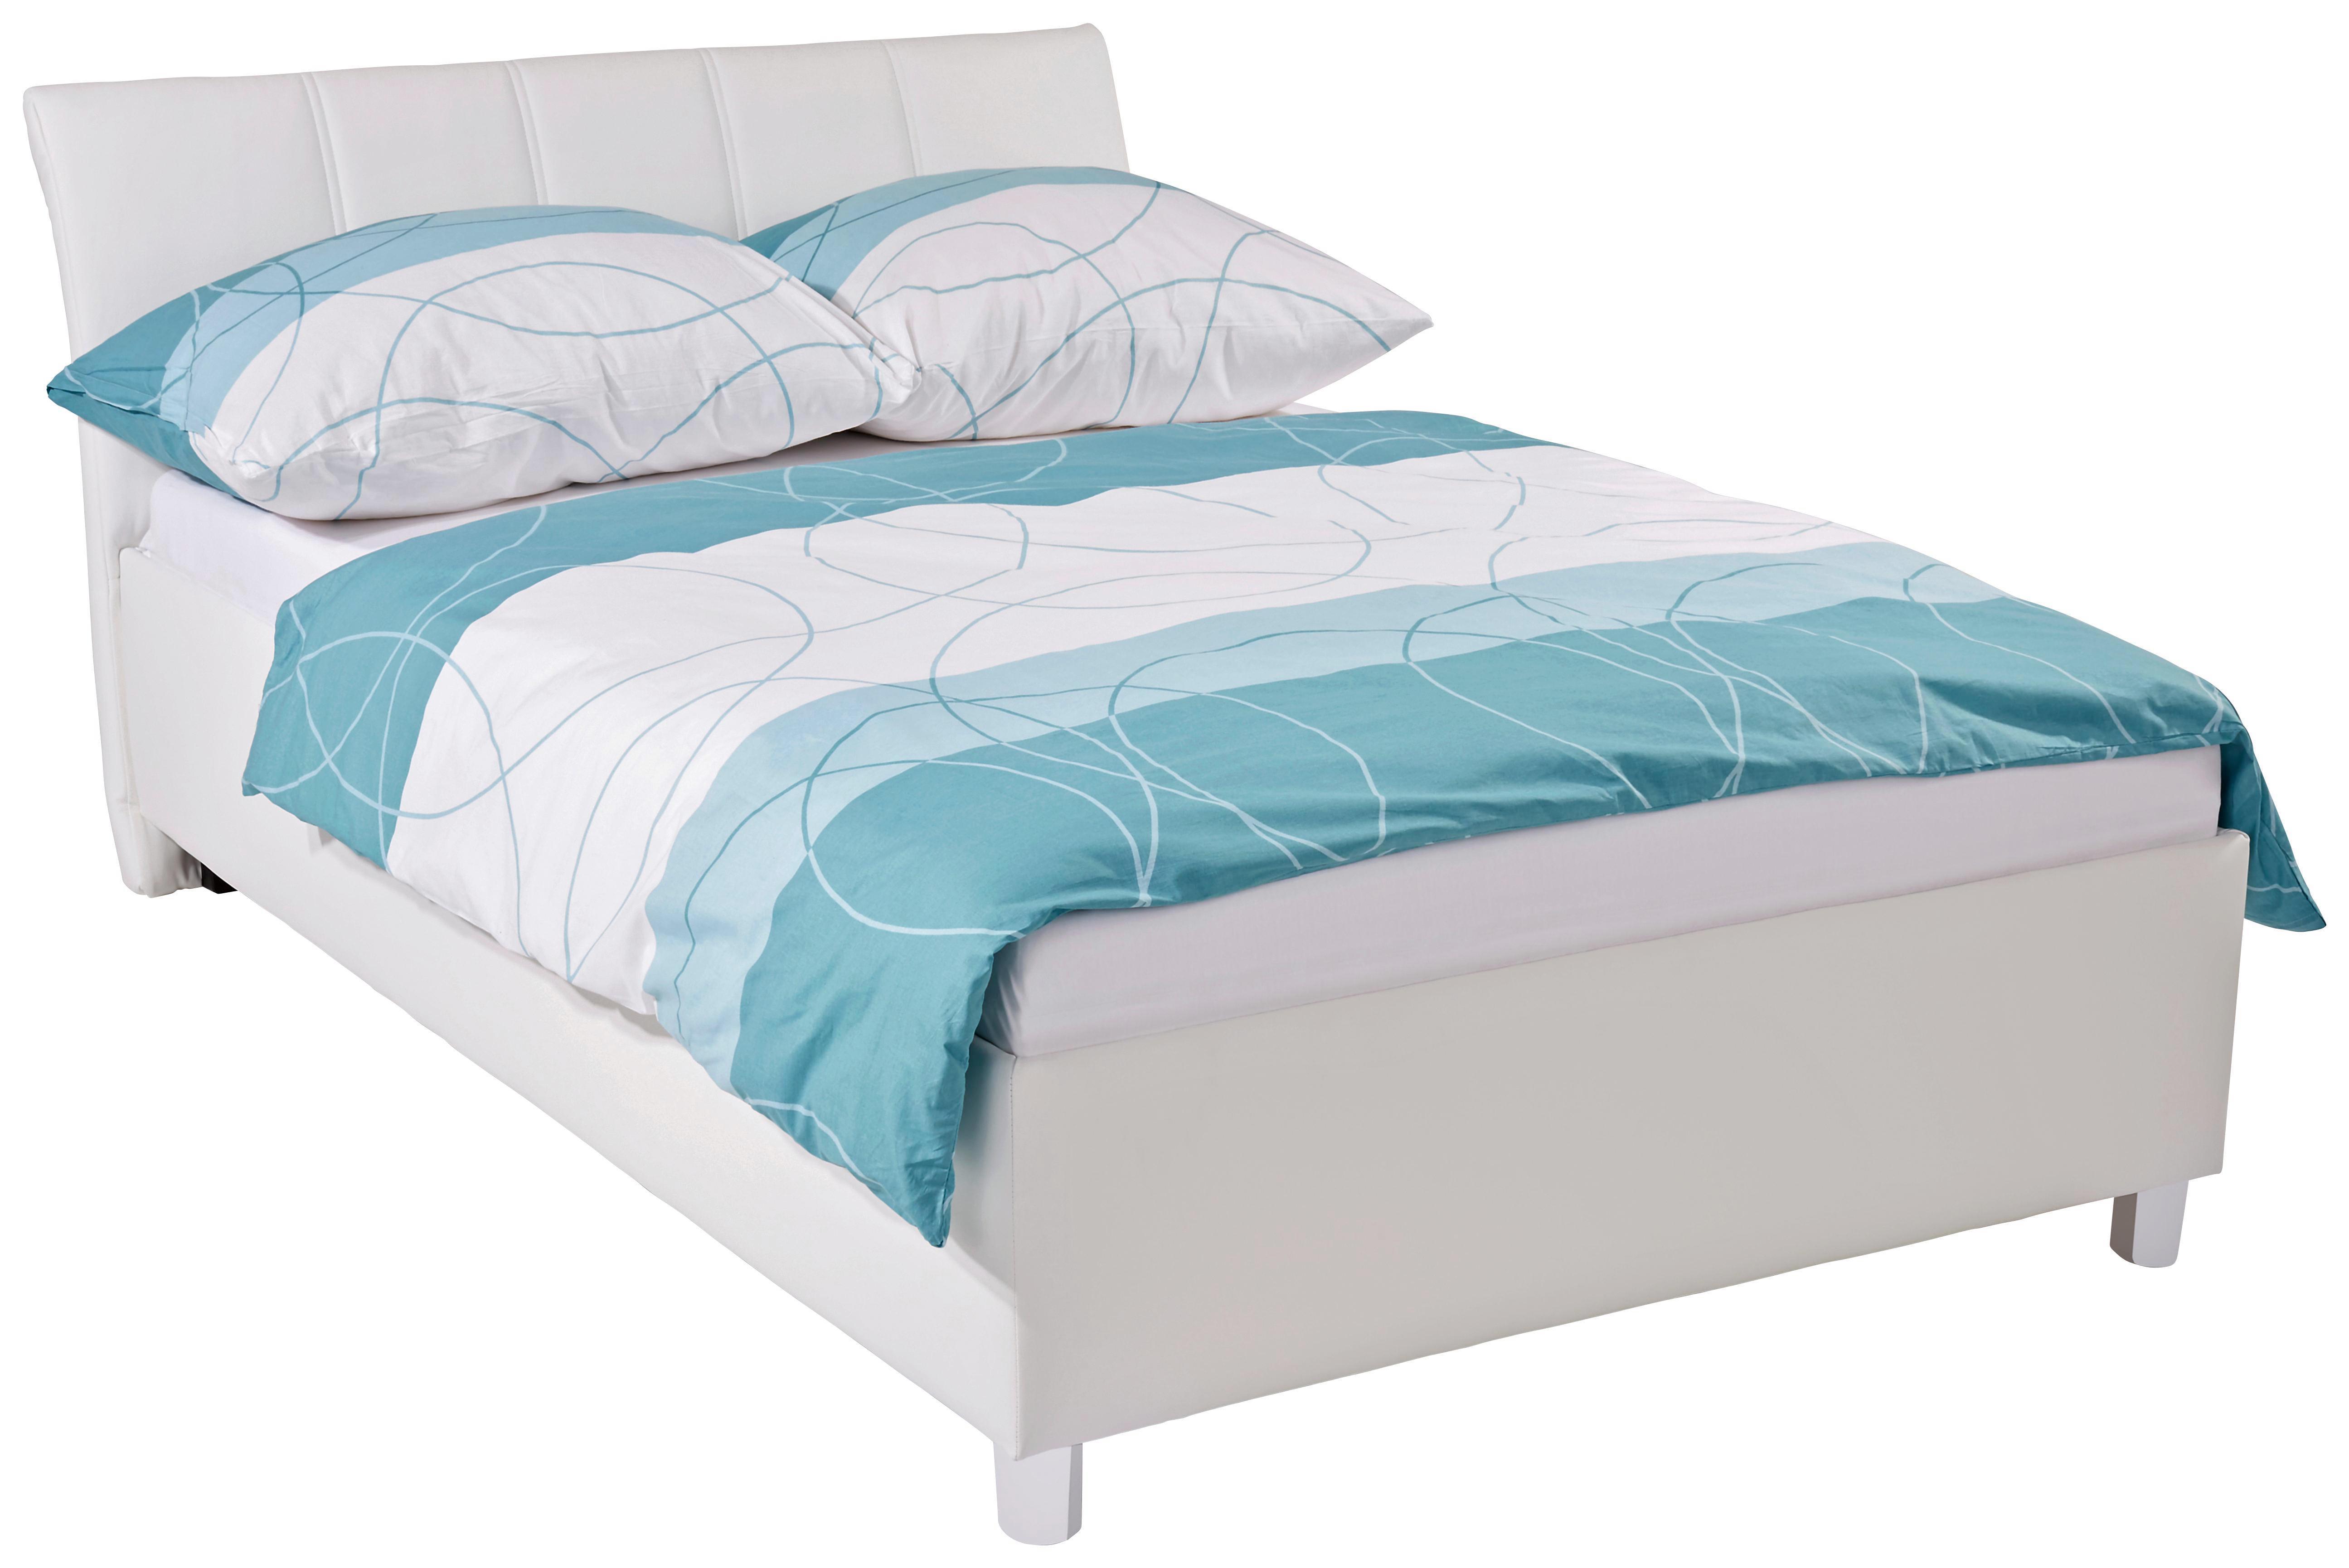 1 40x2 00 fabulous celinatex jersey baumwolle xx cm fr lucina dunkelgrau with 1 40x2 00. Black Bedroom Furniture Sets. Home Design Ideas